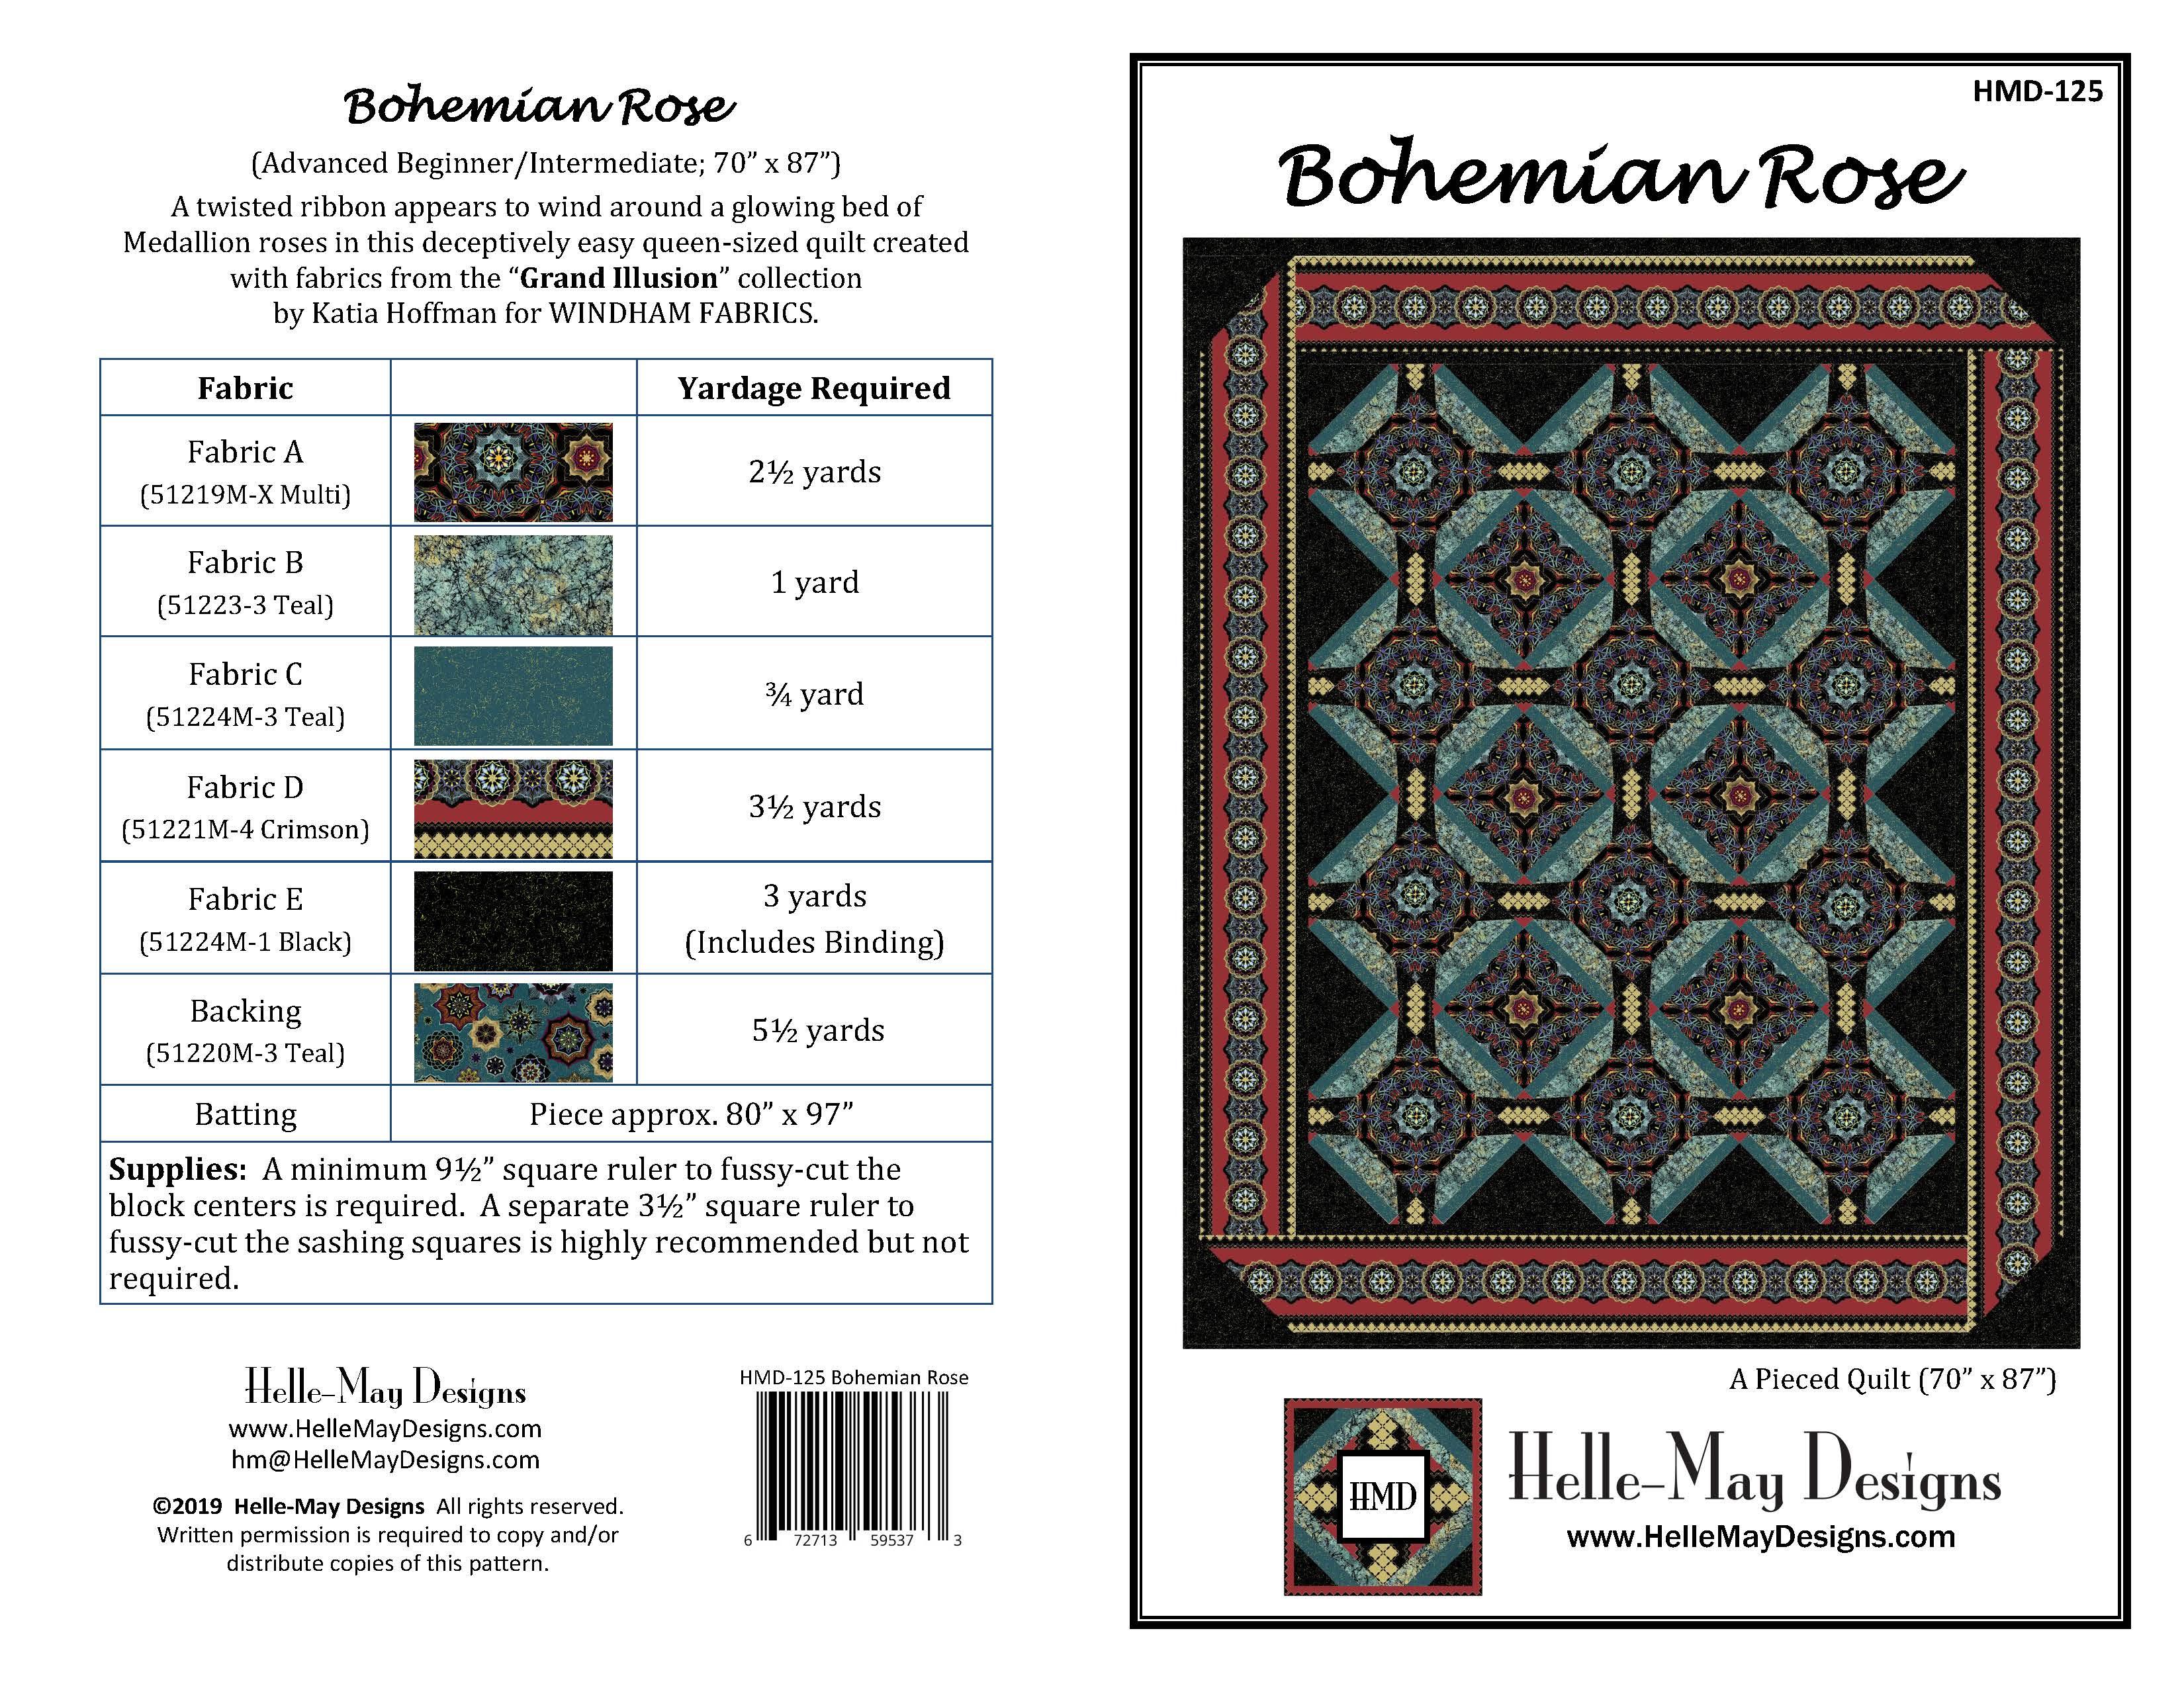 HMD-125 Bohemian Rose